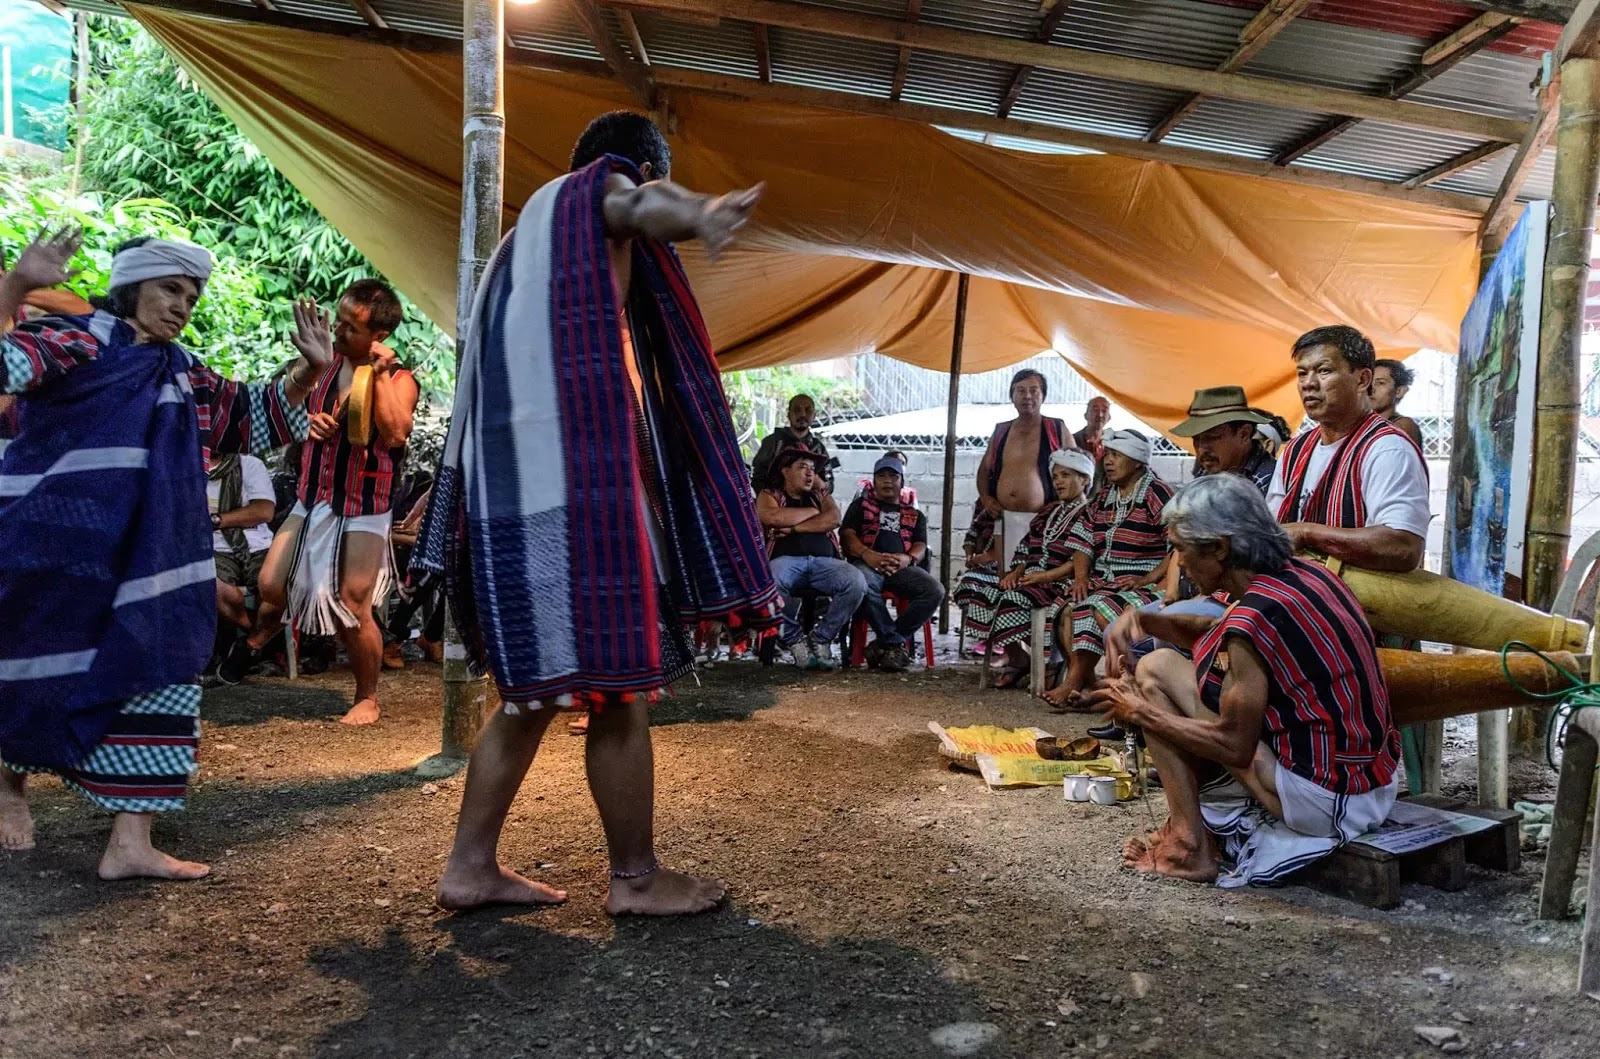 8th Tam-awan International Arts Festival Closing Ceremonies Let Us Dance